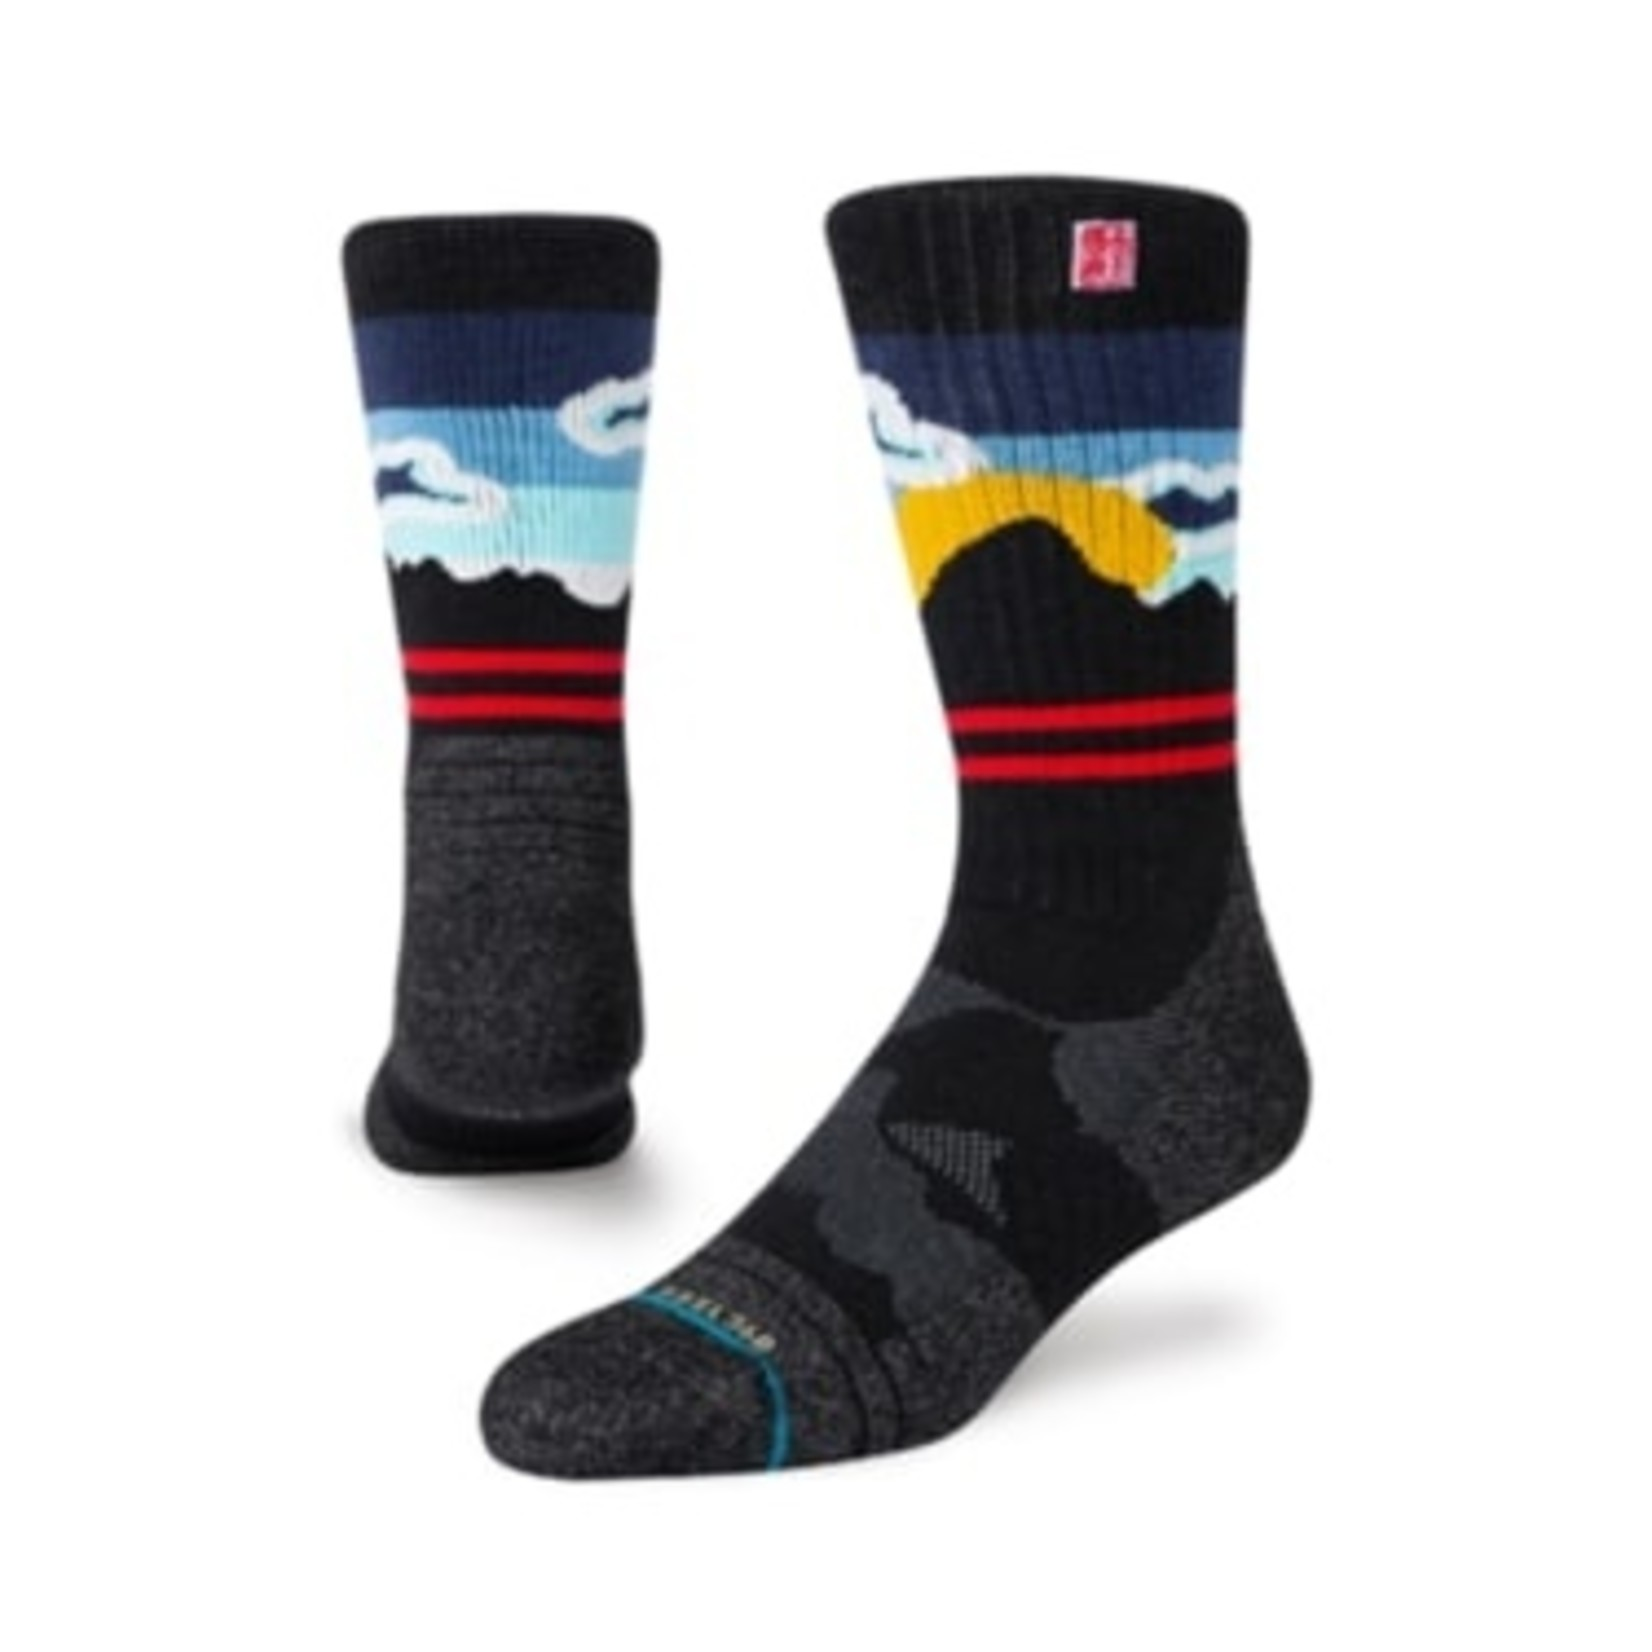 Stance Stance Adventure Socks